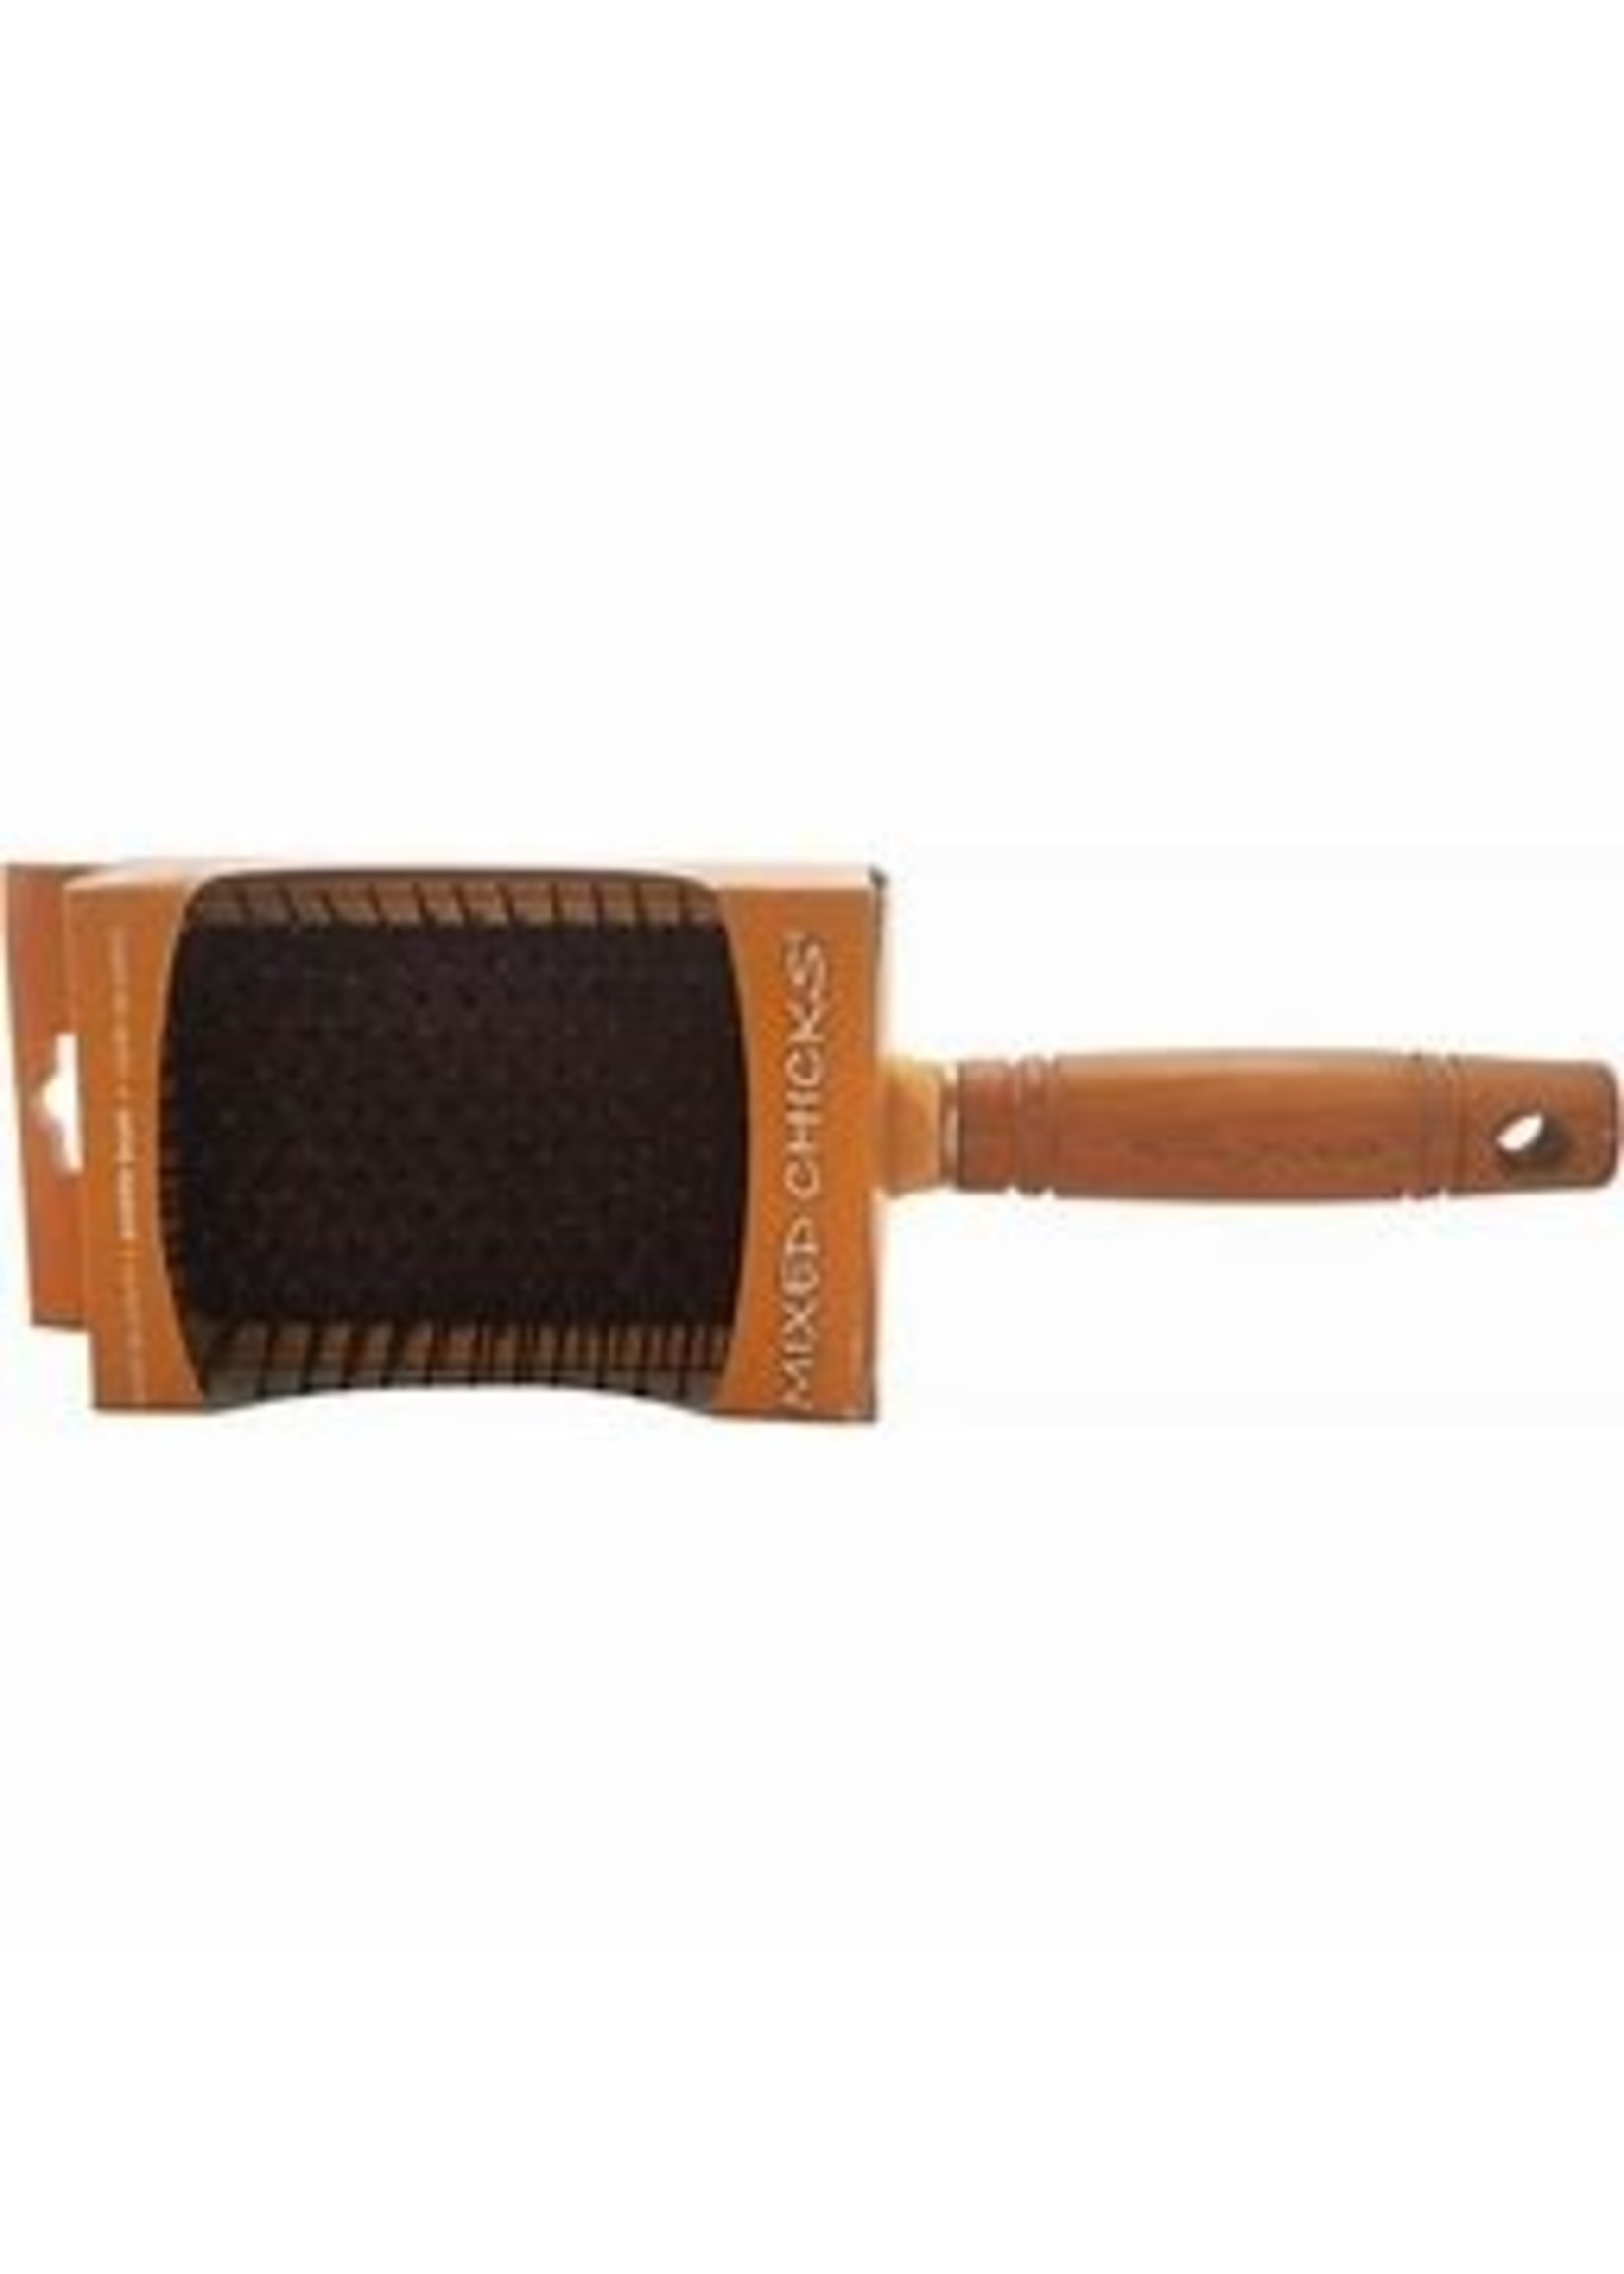 Mixed Chicks MC Paddle Brush